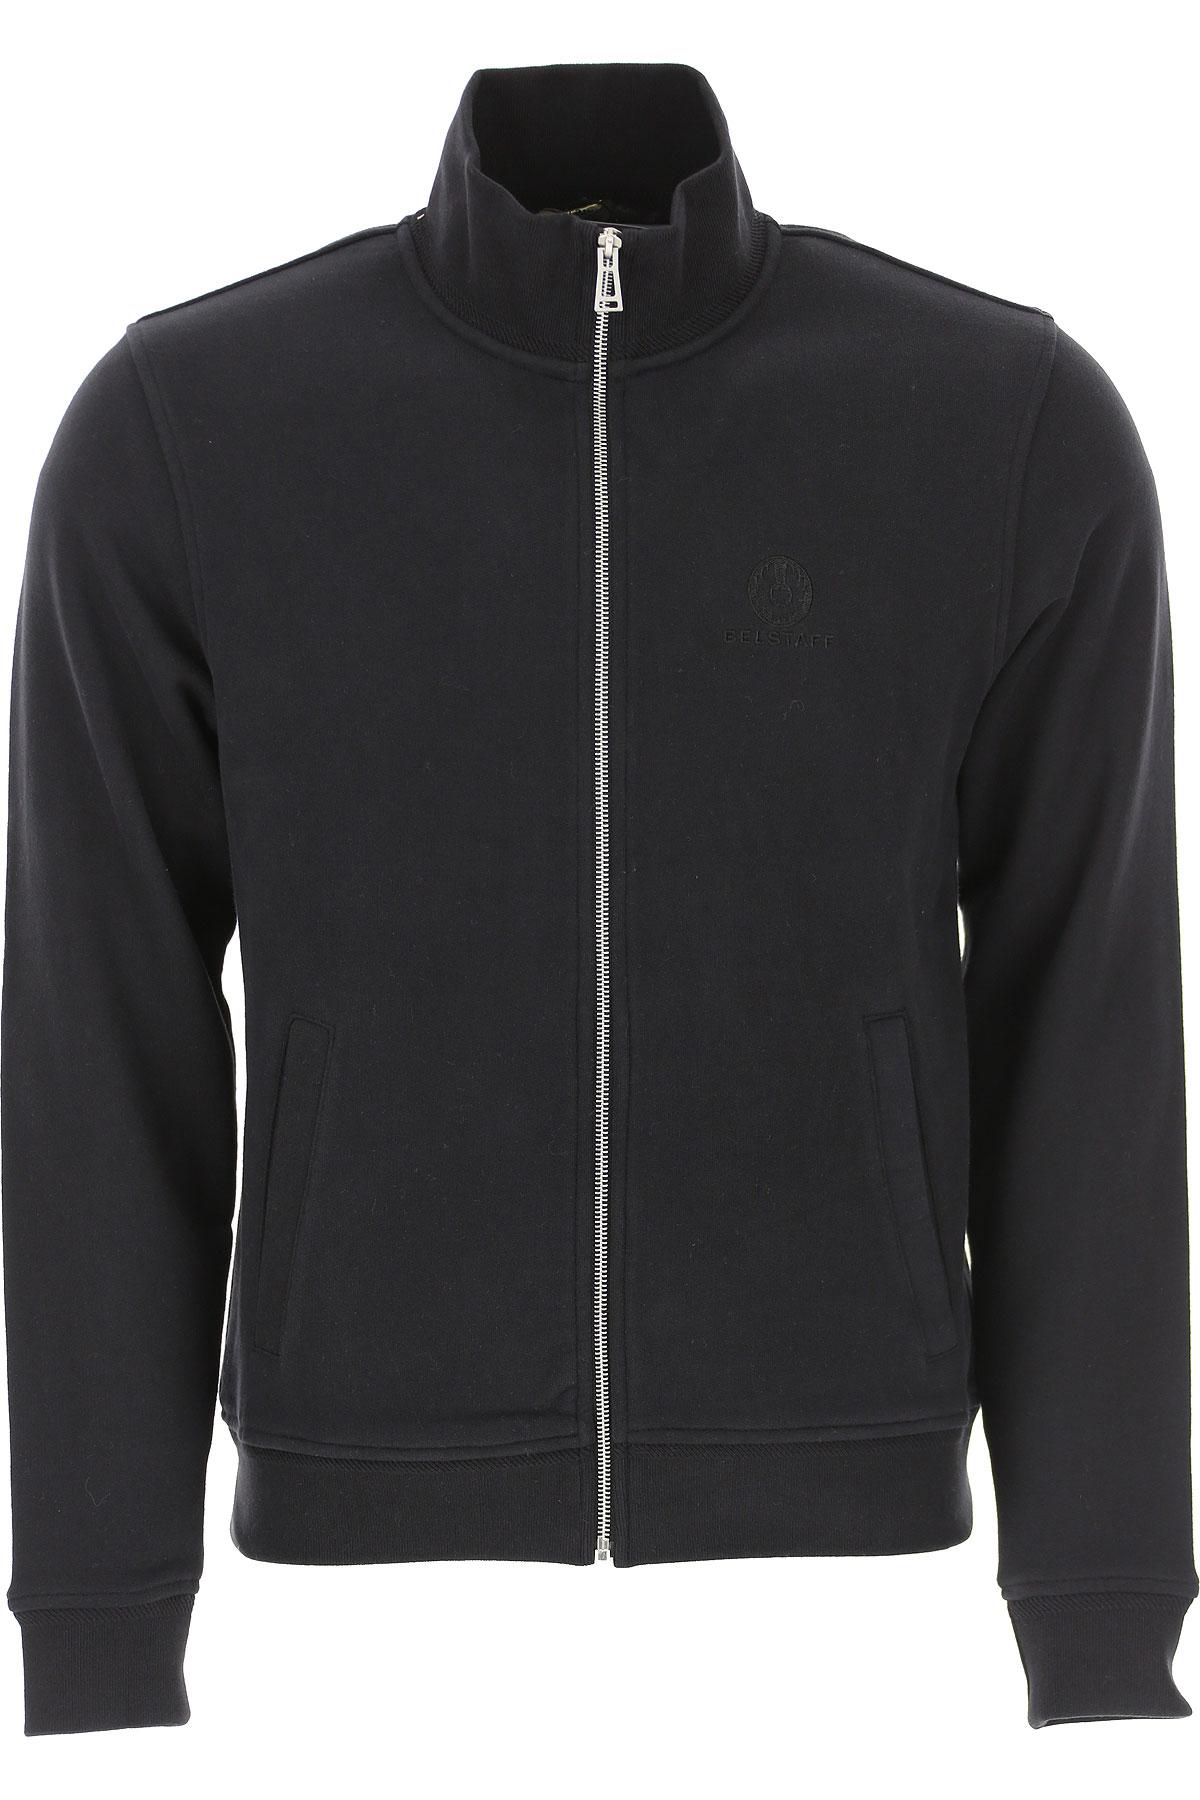 Belstaff Sweatshirt for Men On Sale, Black, Cotton, 2019, L M S